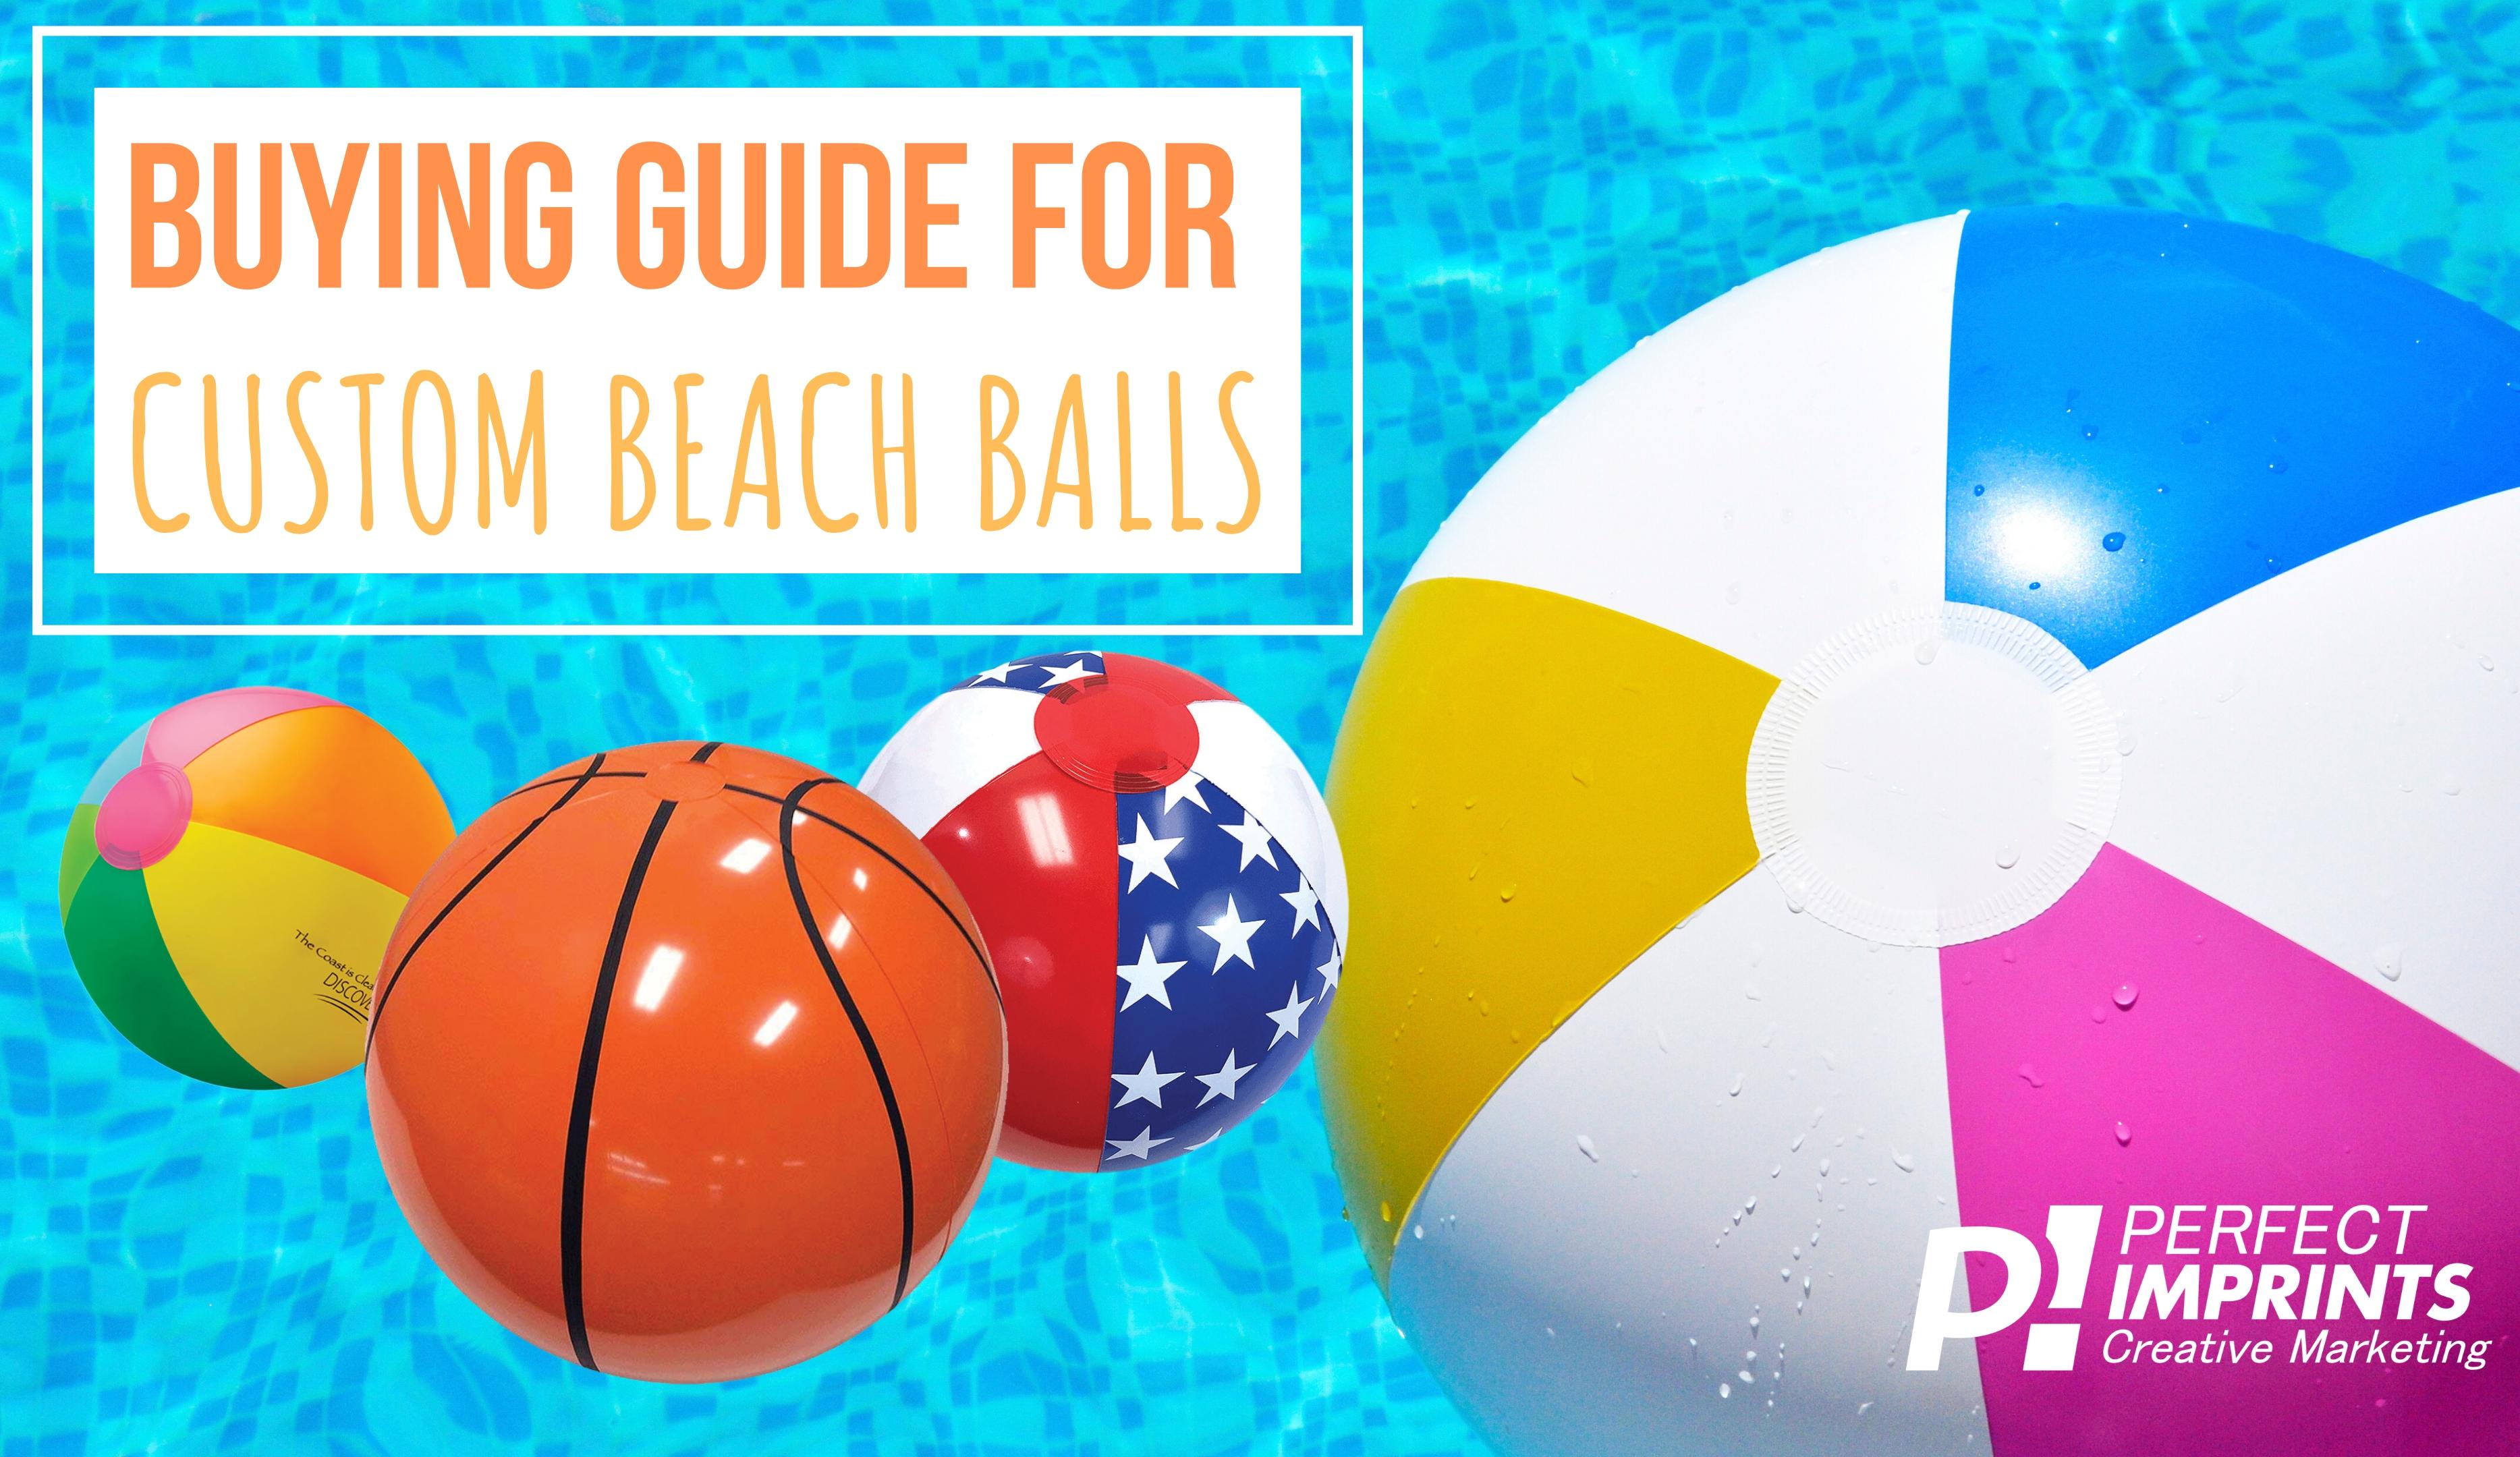 Buying Guide for Custom Beach Balls